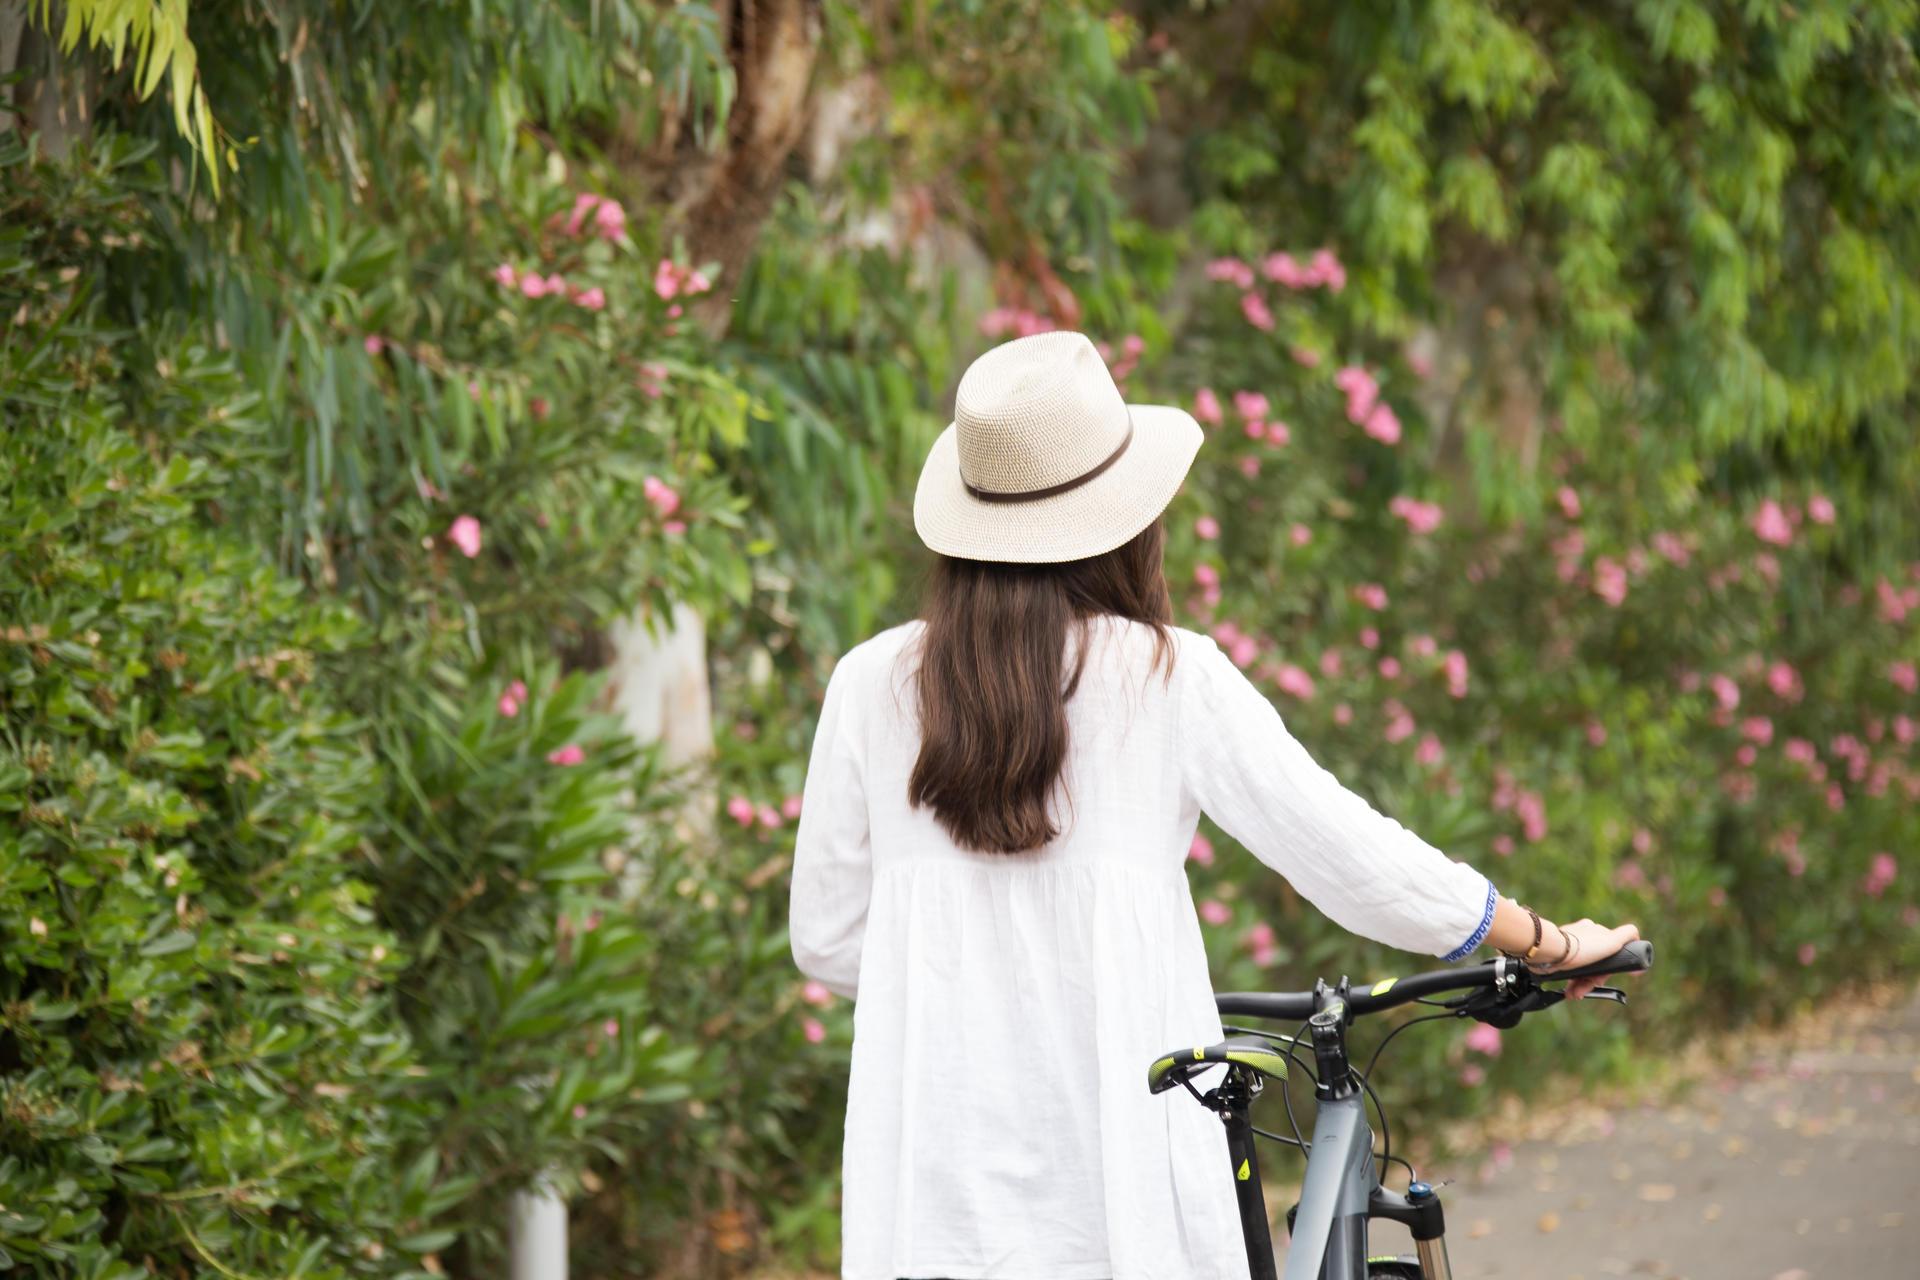 Bike & Gardens at Cretan Malia Park